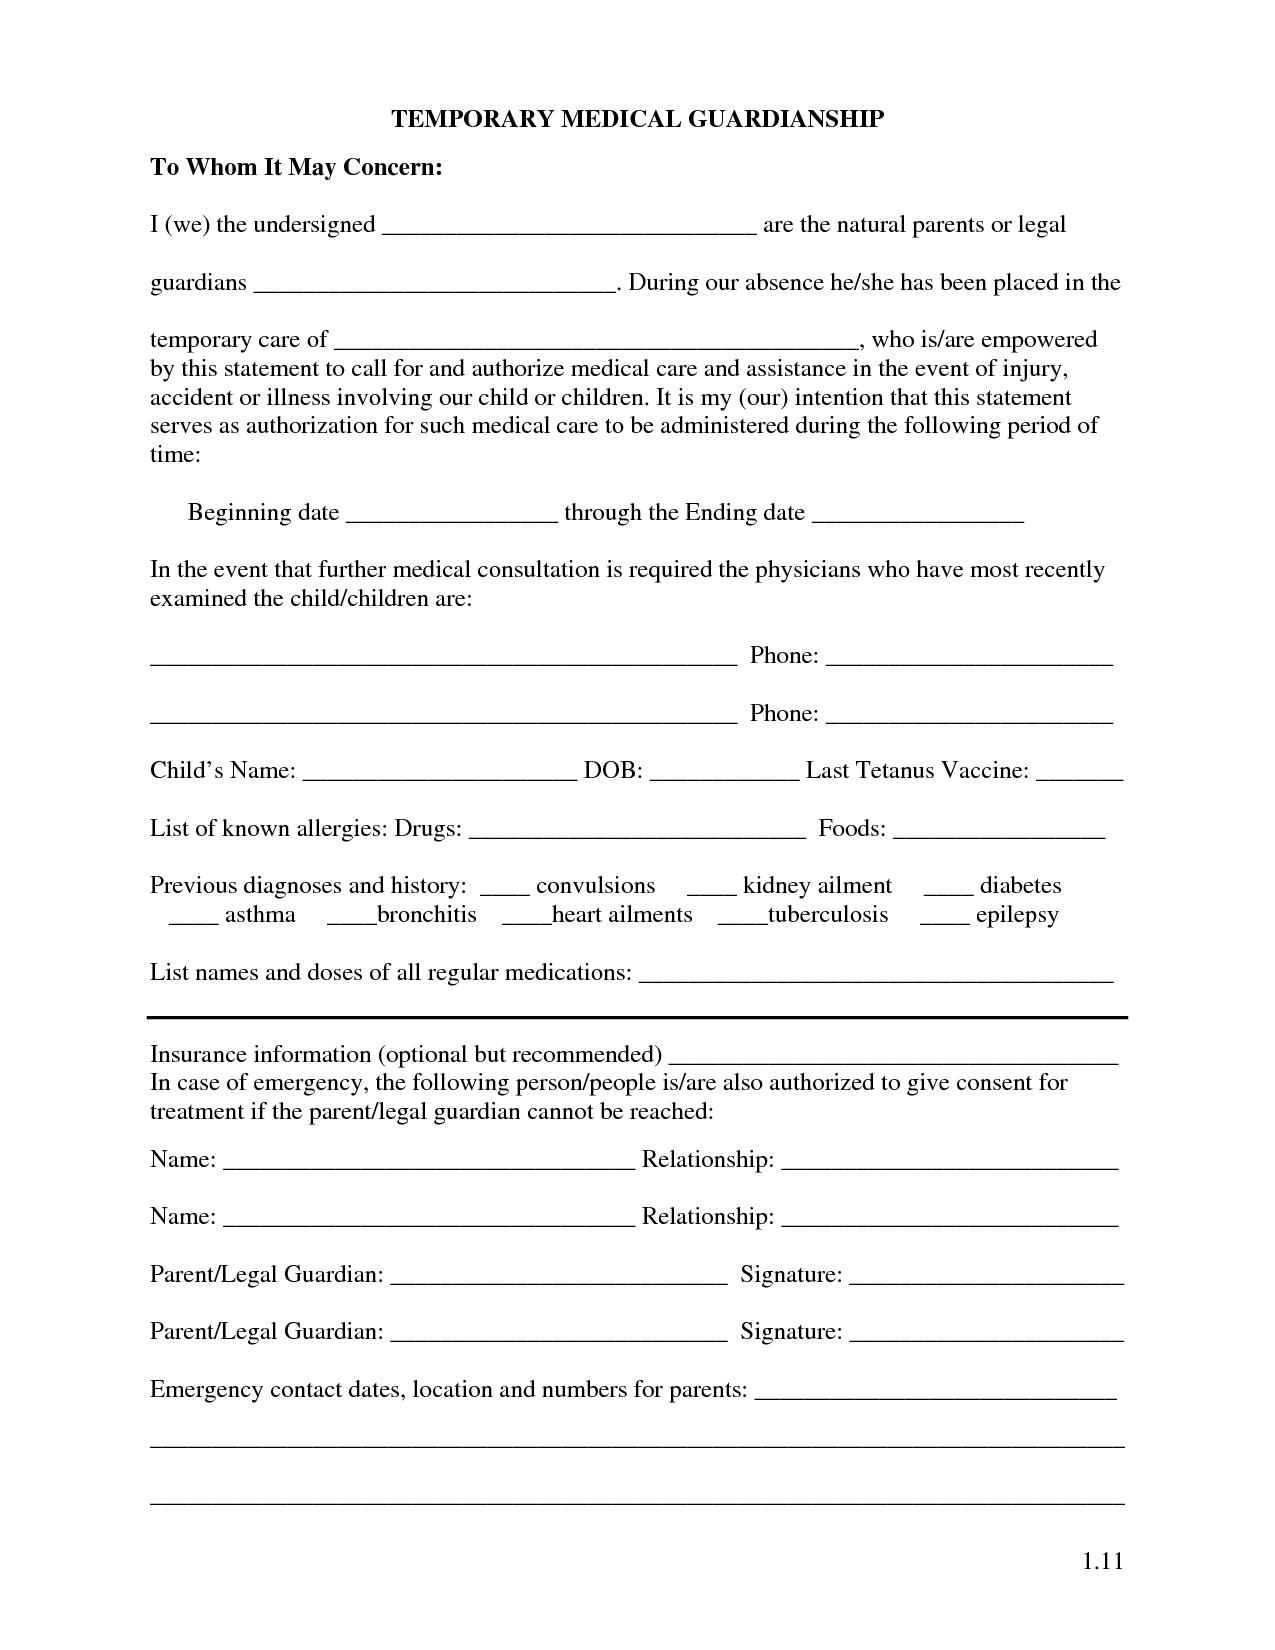 Free Printable Temporary Guardianship Forms   Forms   Child Custody - Free Printable Temporary Guardianship Form